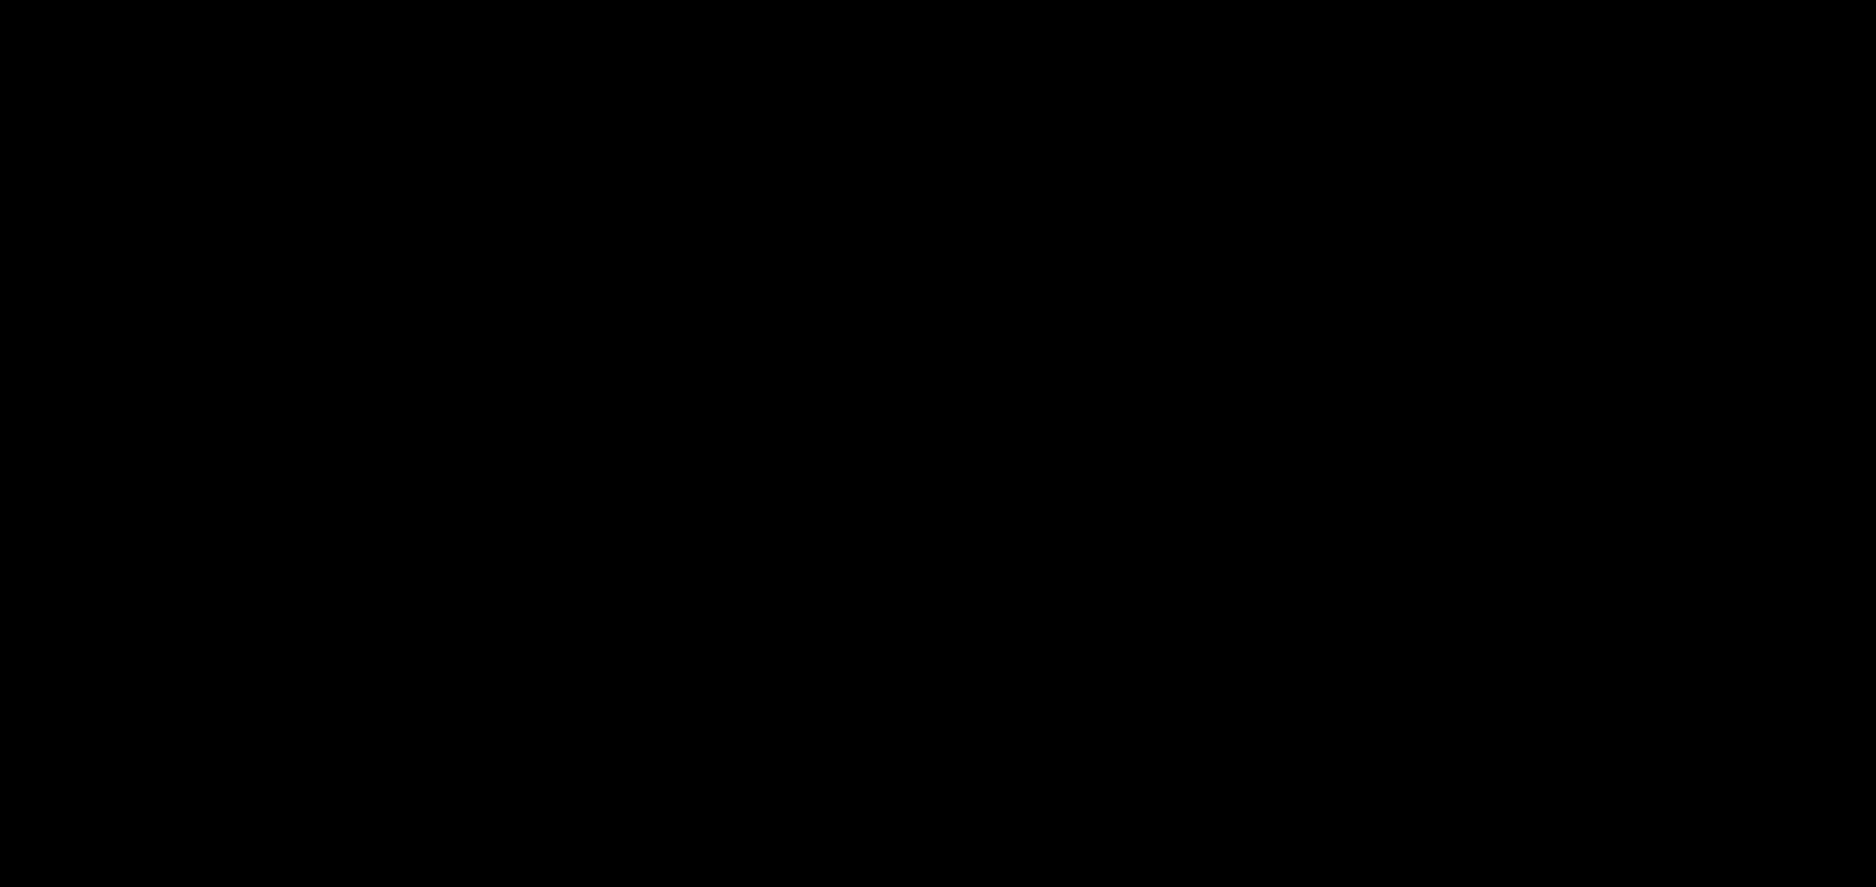 spoonline bistro logo